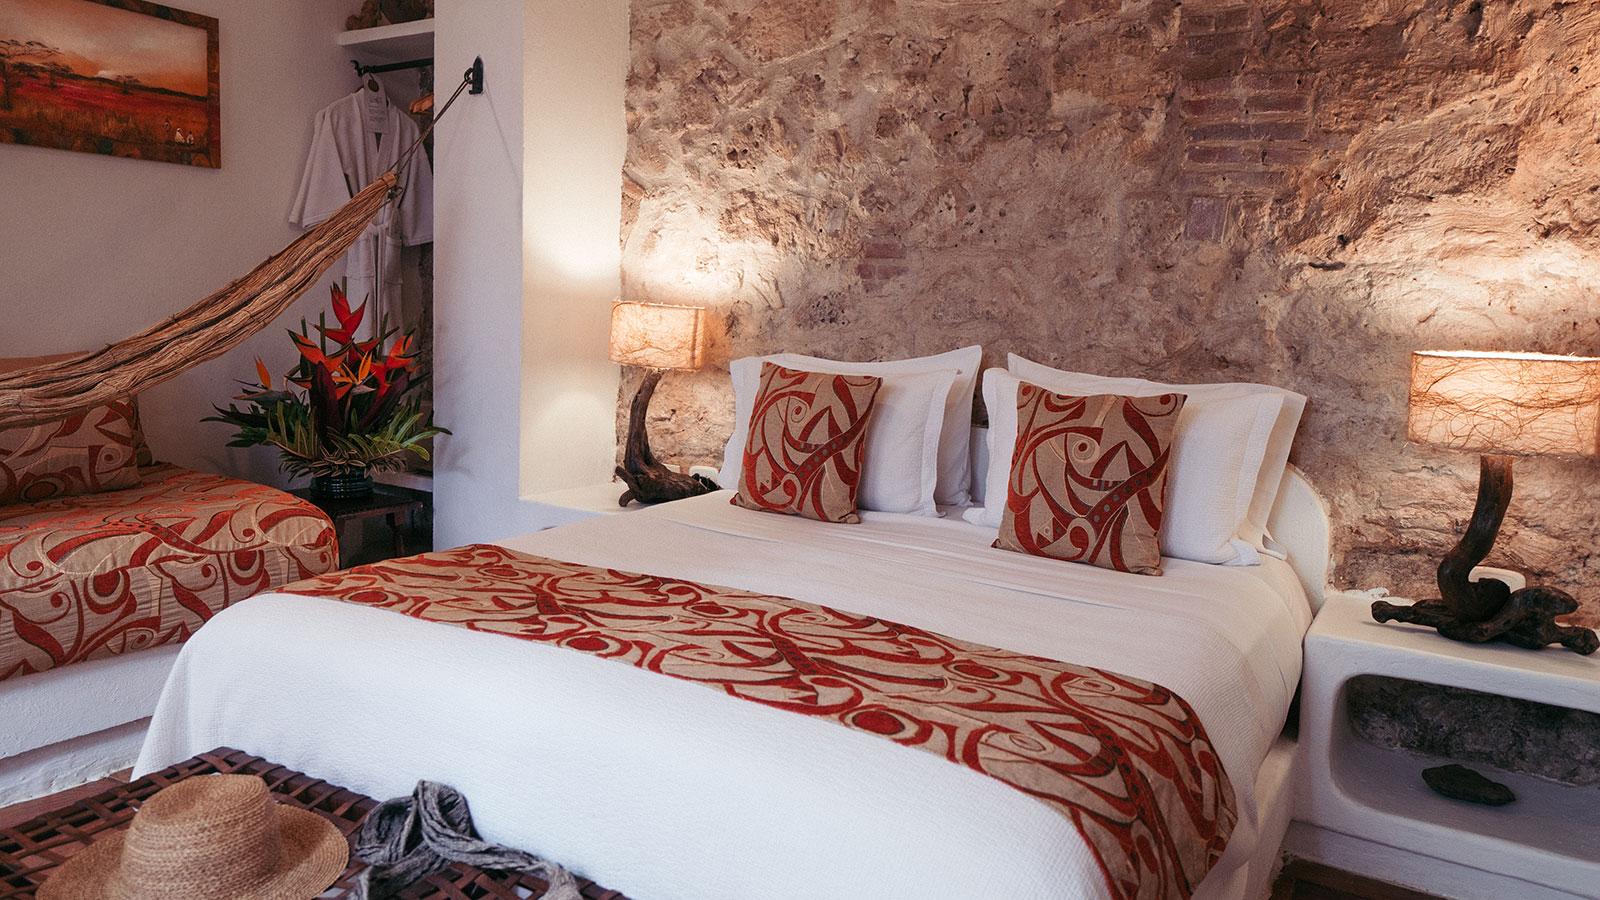 Image of guestroom Alfiz Hotel, 1700, Member of Historic Hotels Worldwide, in Cartagena de Indias, Colombia,Accommodations